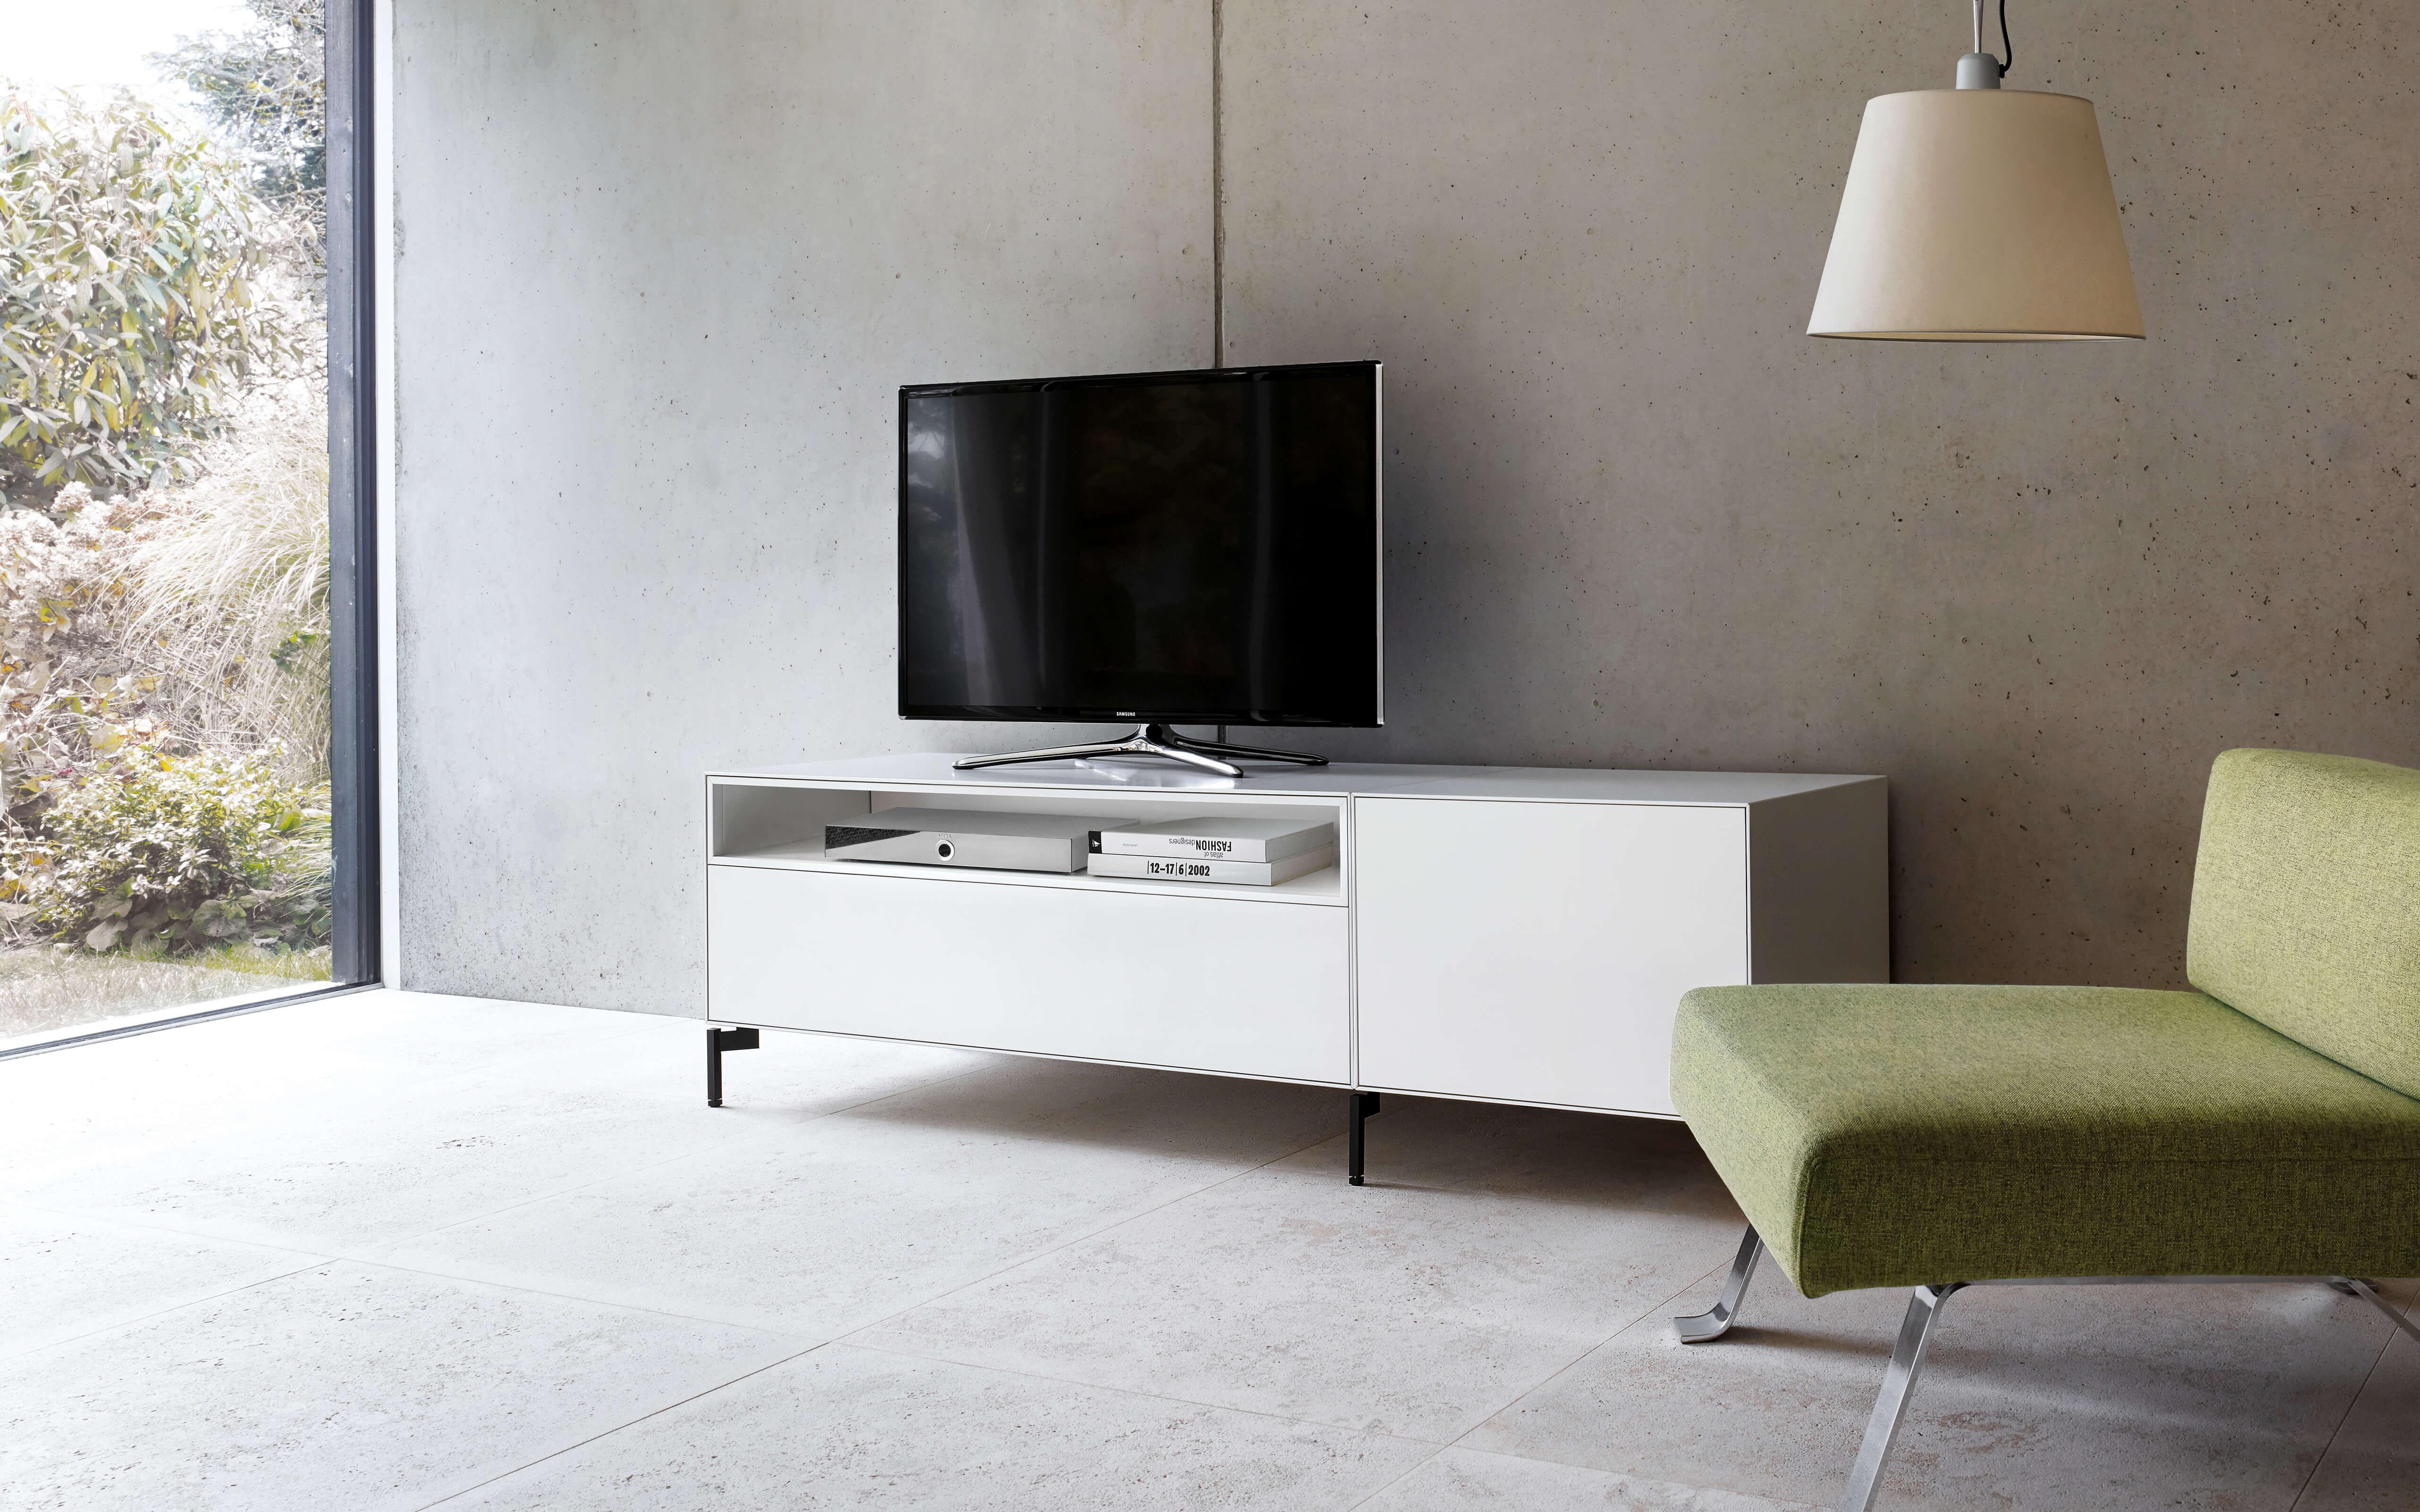 Piure Creating Living Space Sideboard Nex Line Regal Flex Puro